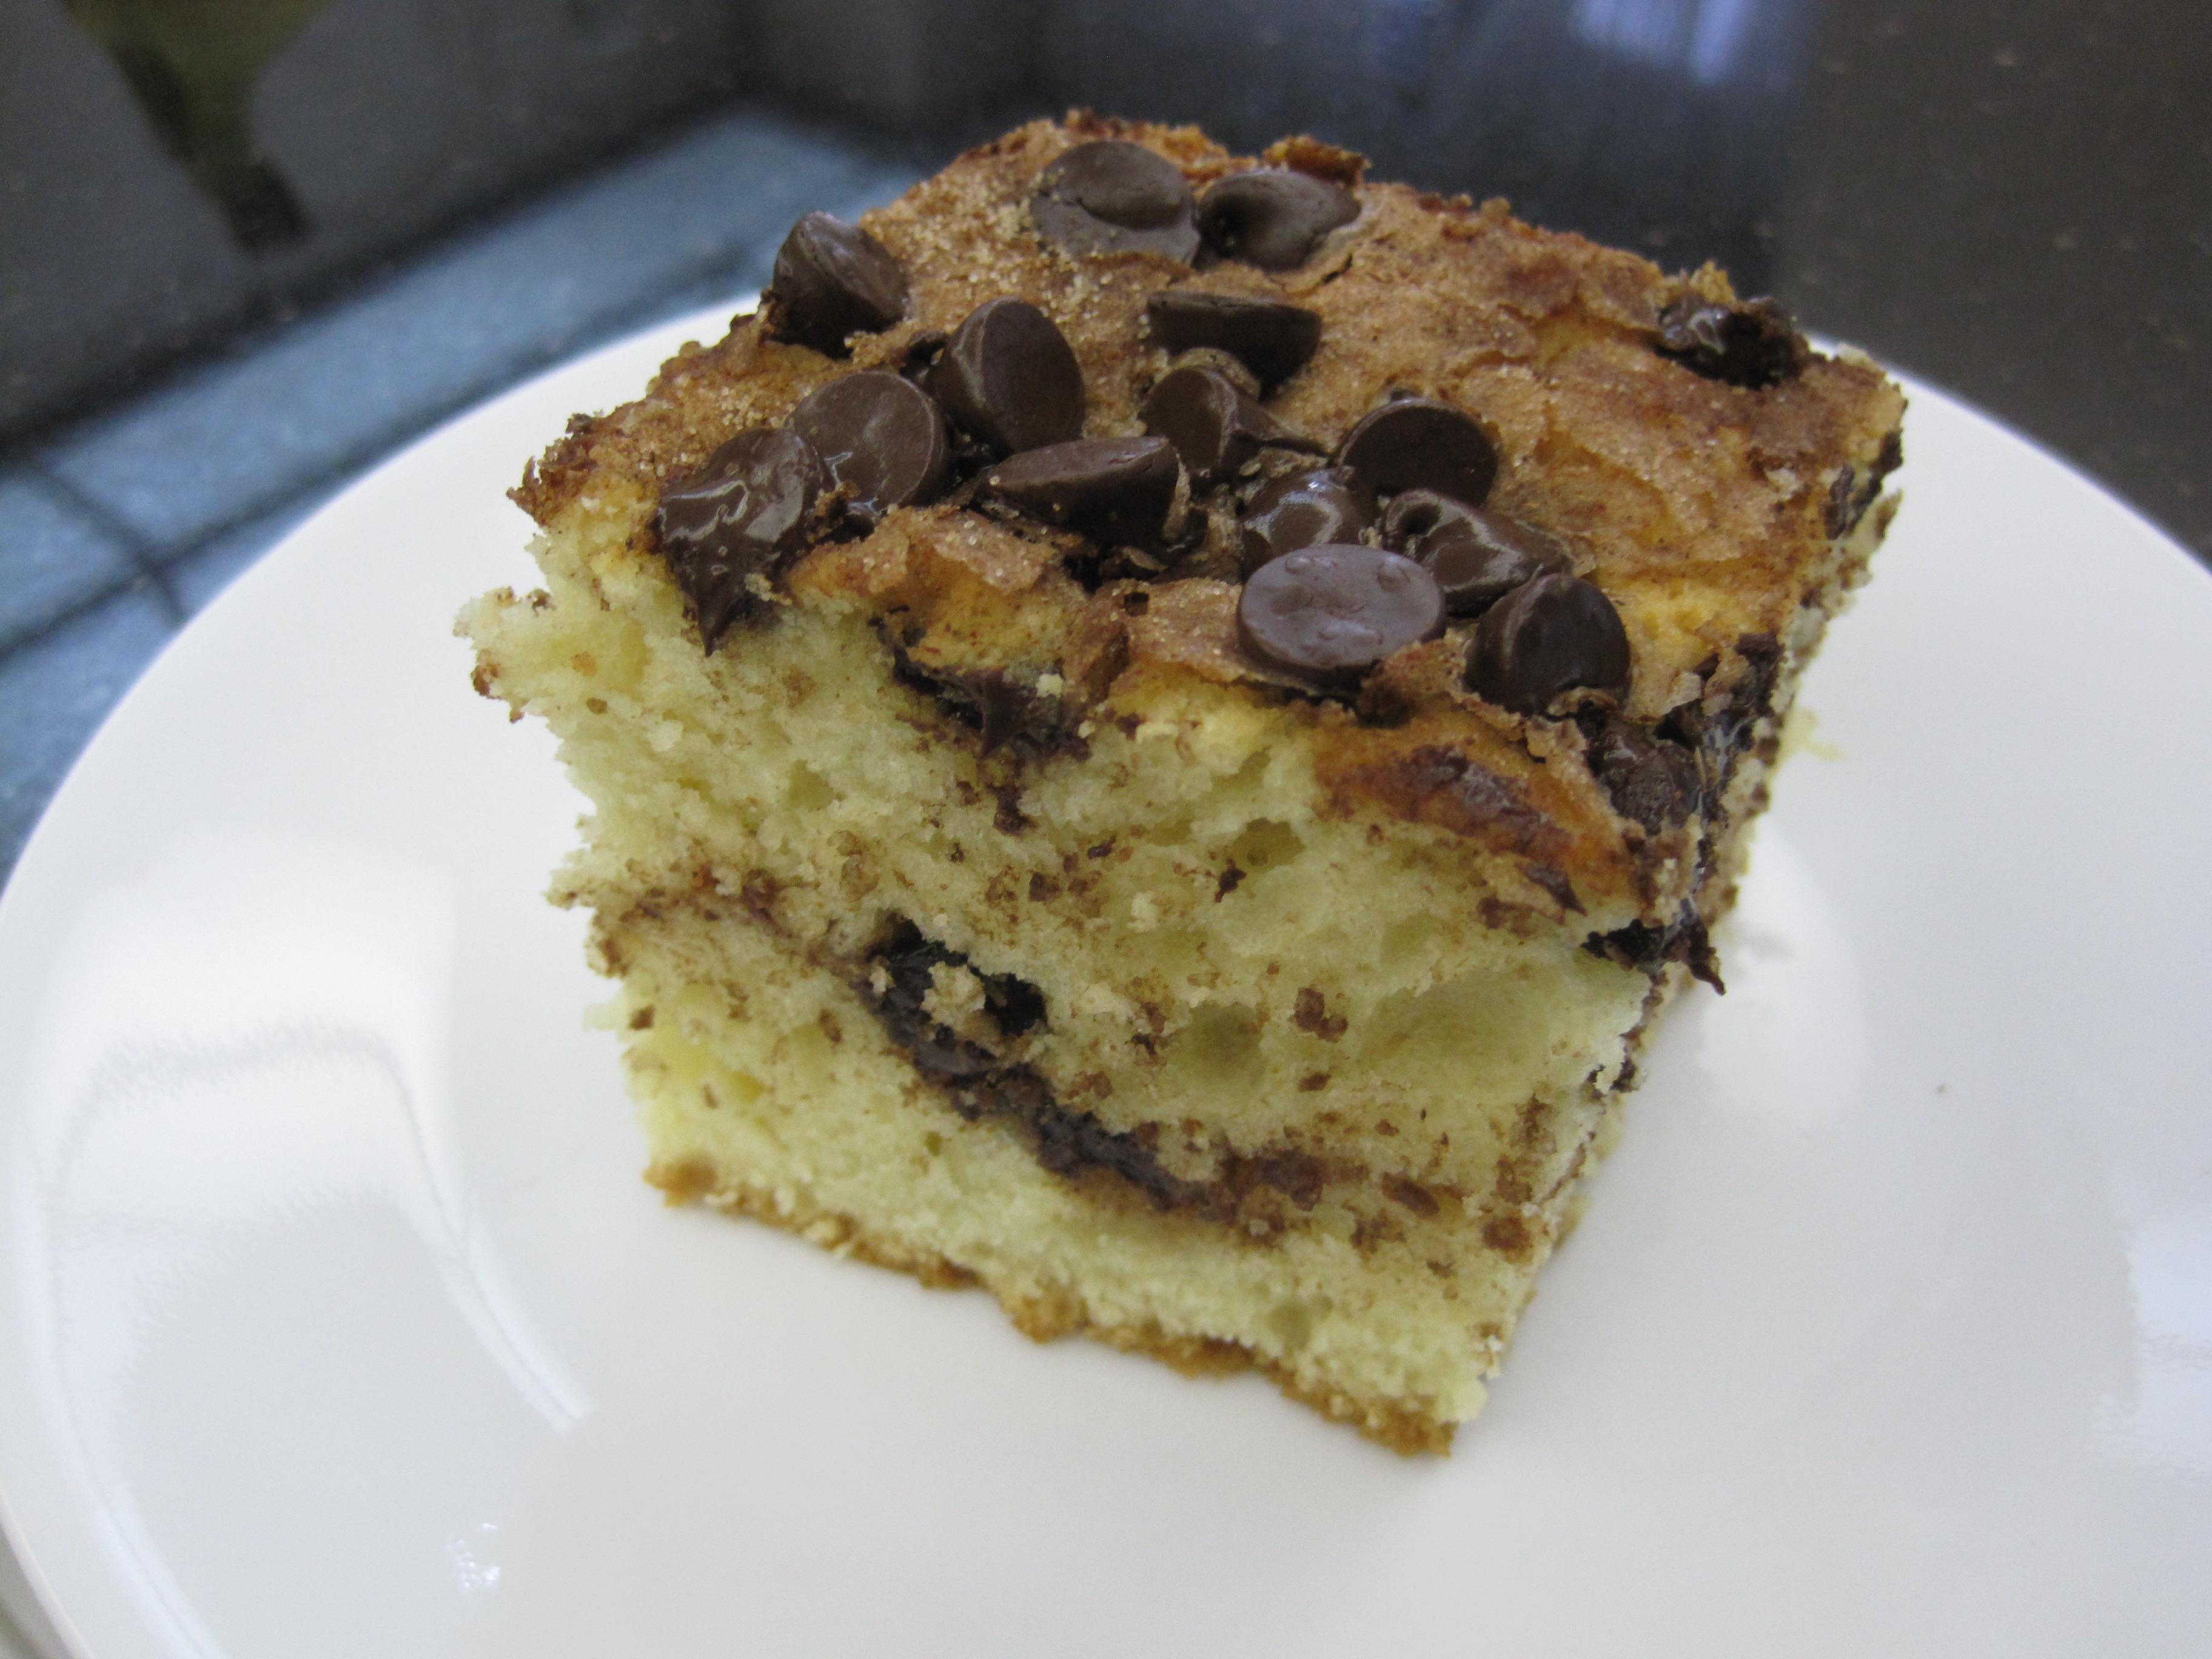 Best Sour Cream Chocolate Chip Coffee Cake